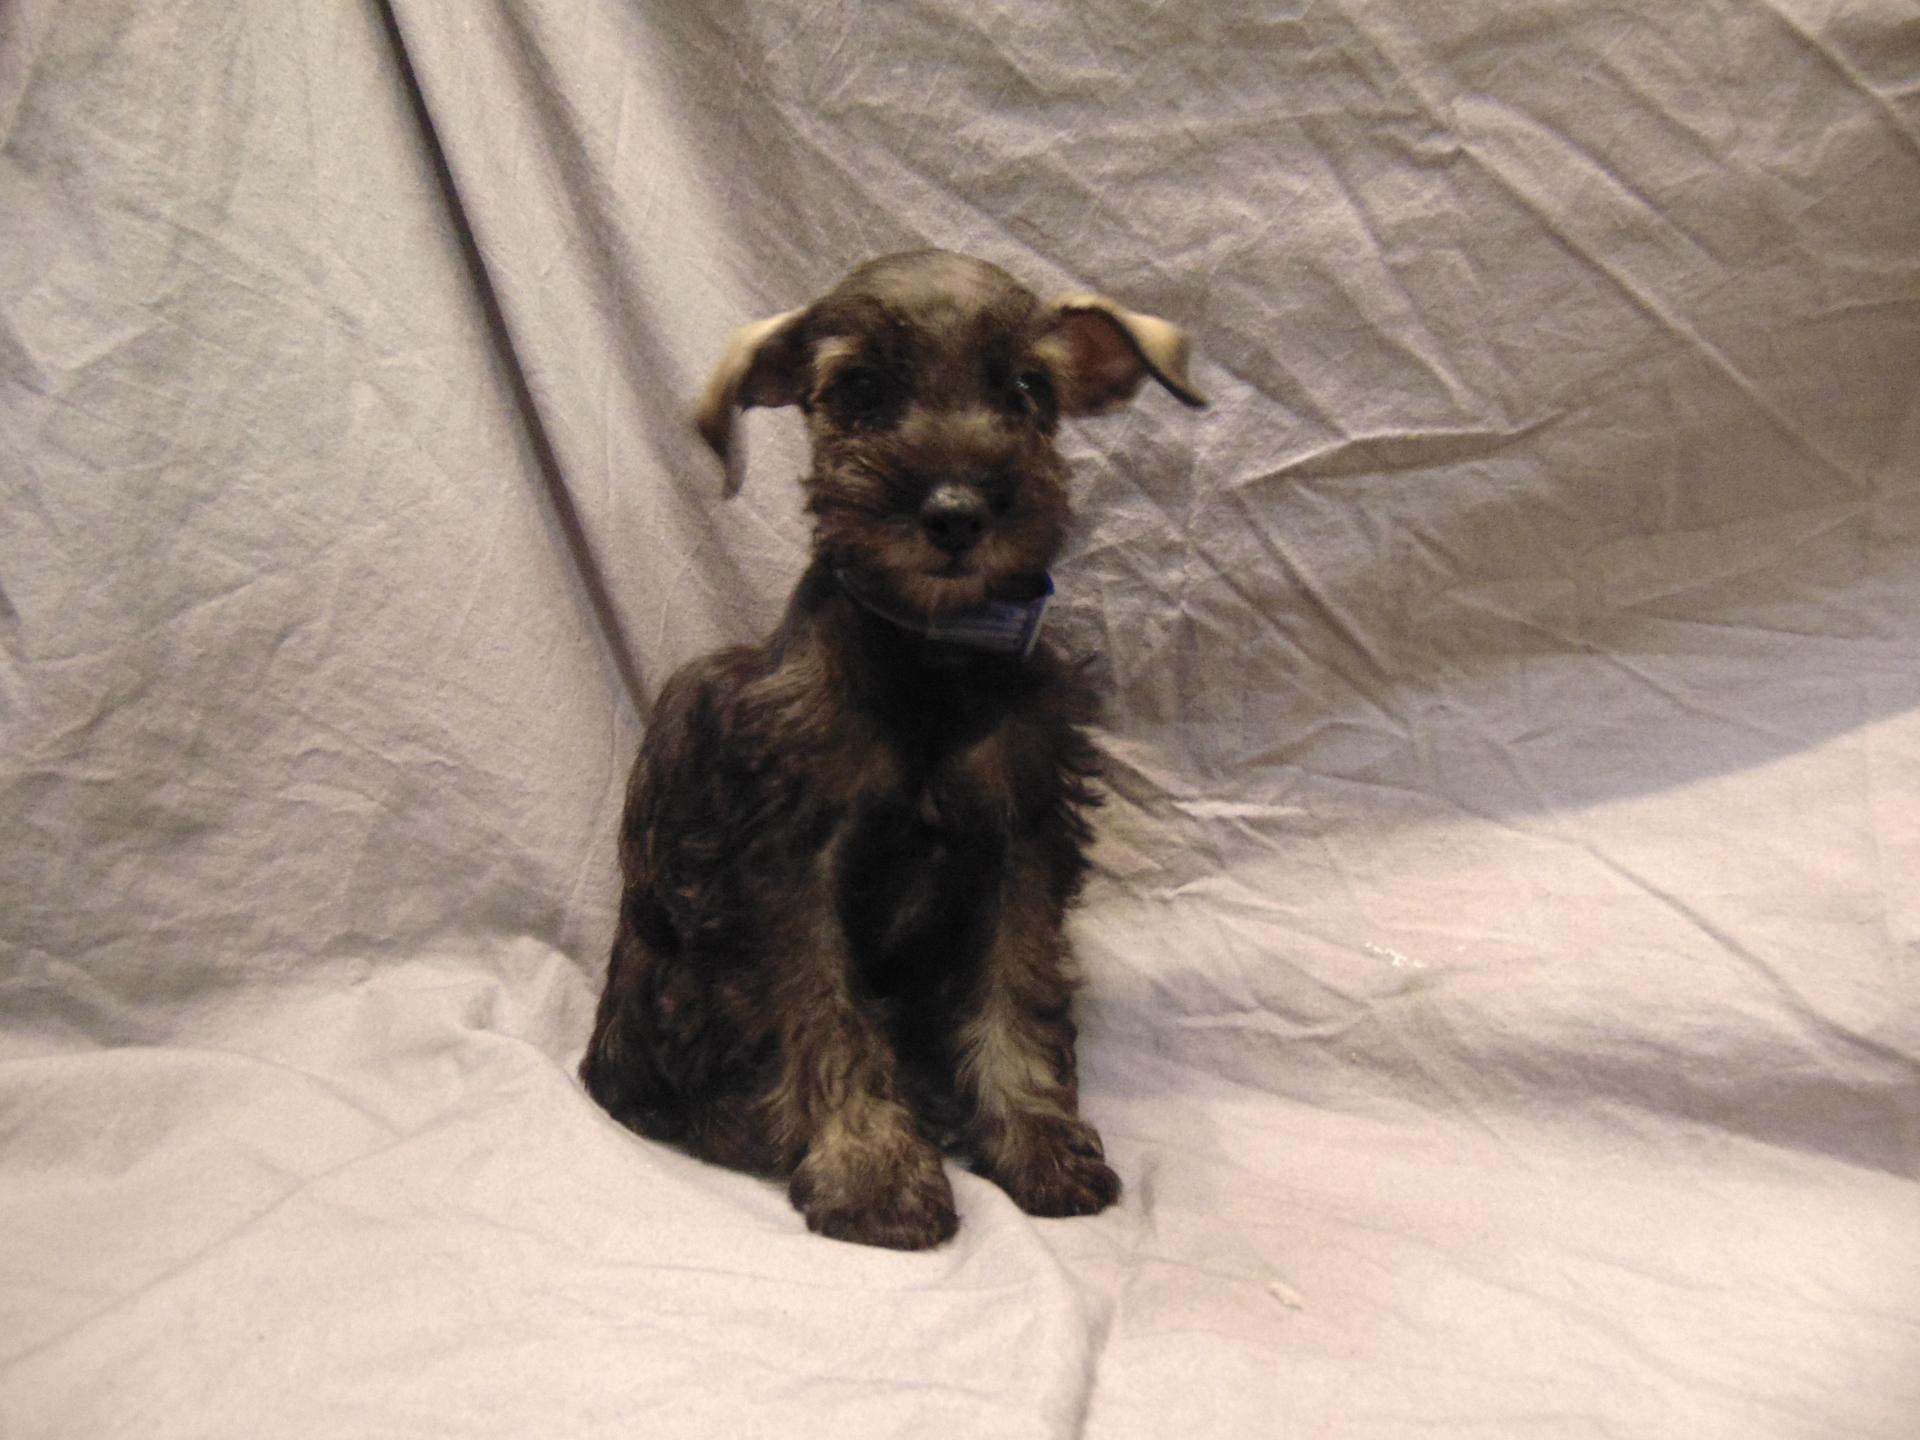 #9697 - Female Schnoodle (Miniature Schnauzer/Poodle)